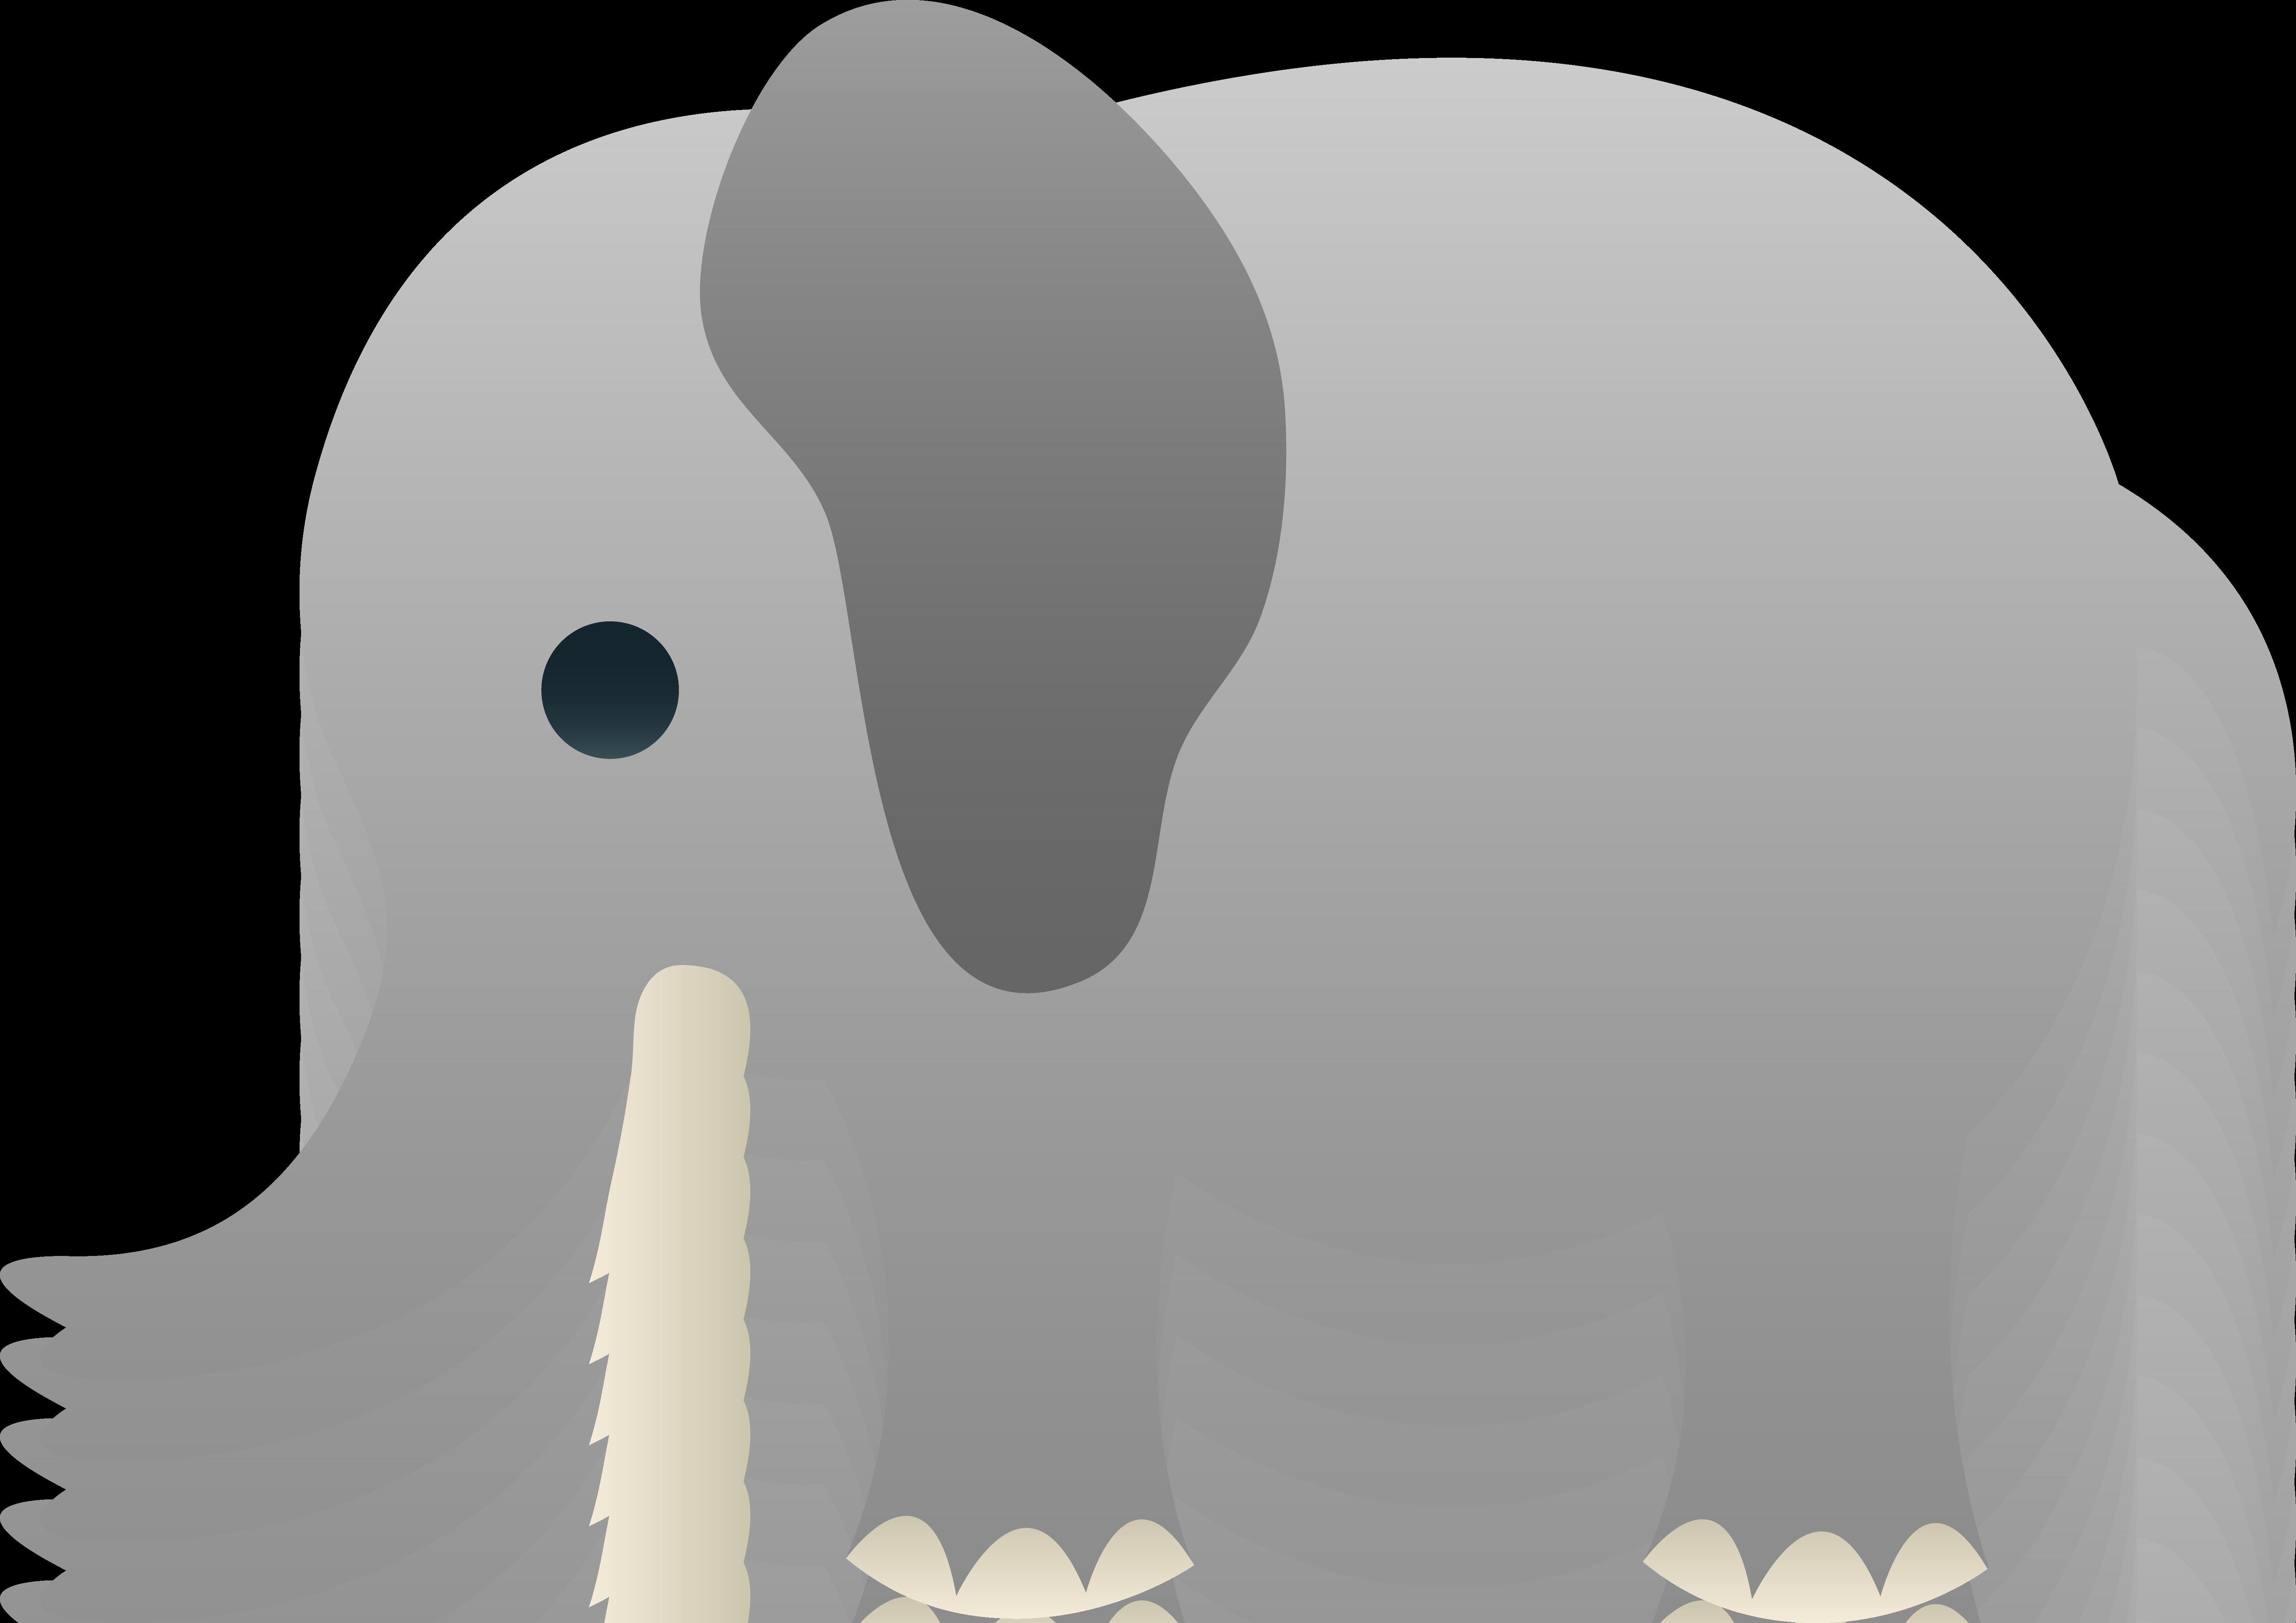 Clipart baby elephant - .